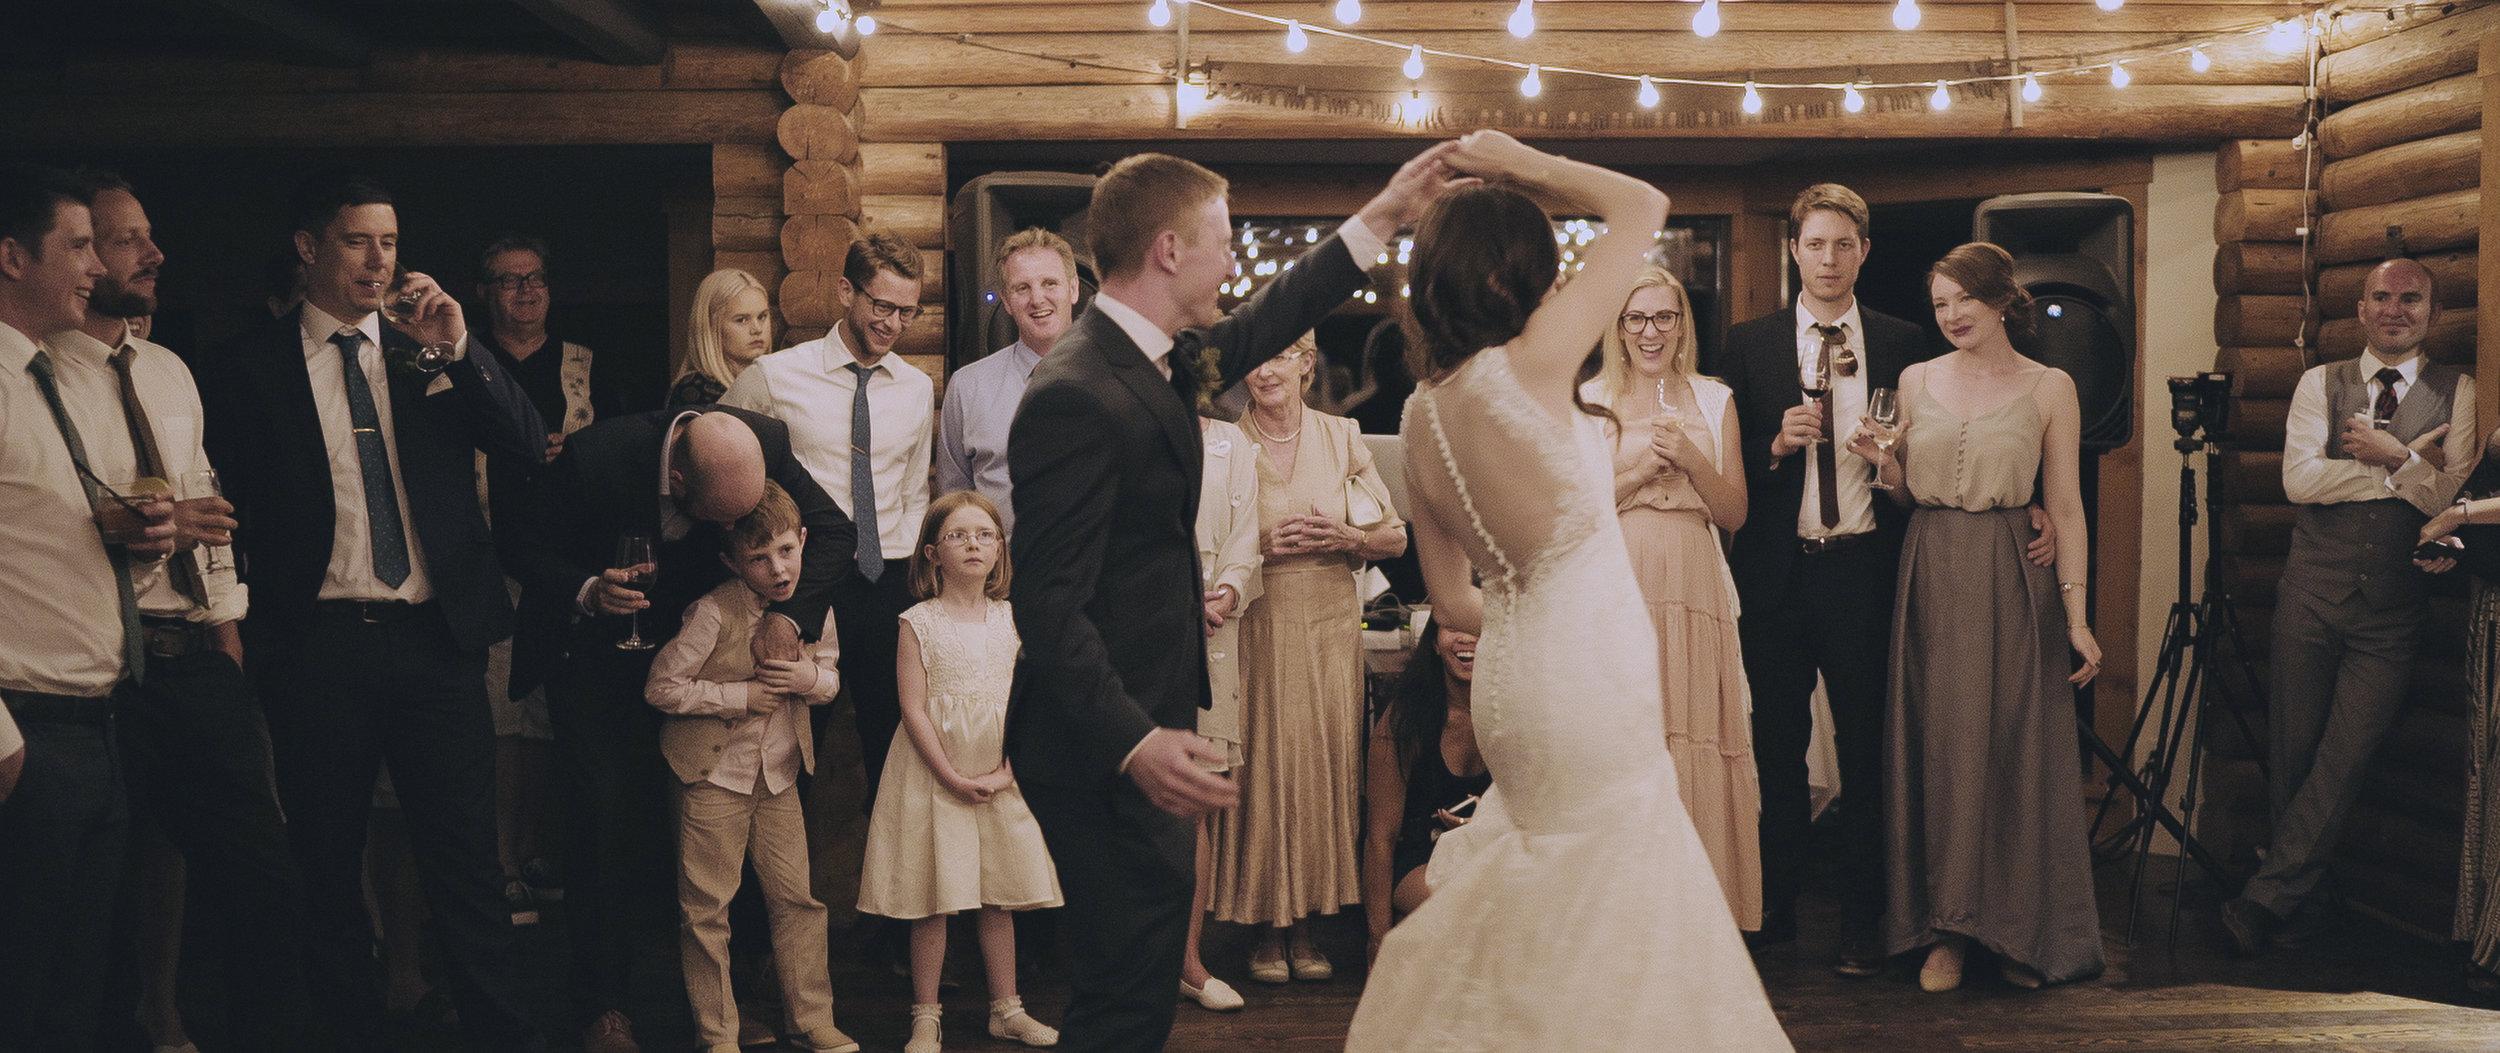 BC Wedding Videography.jpg